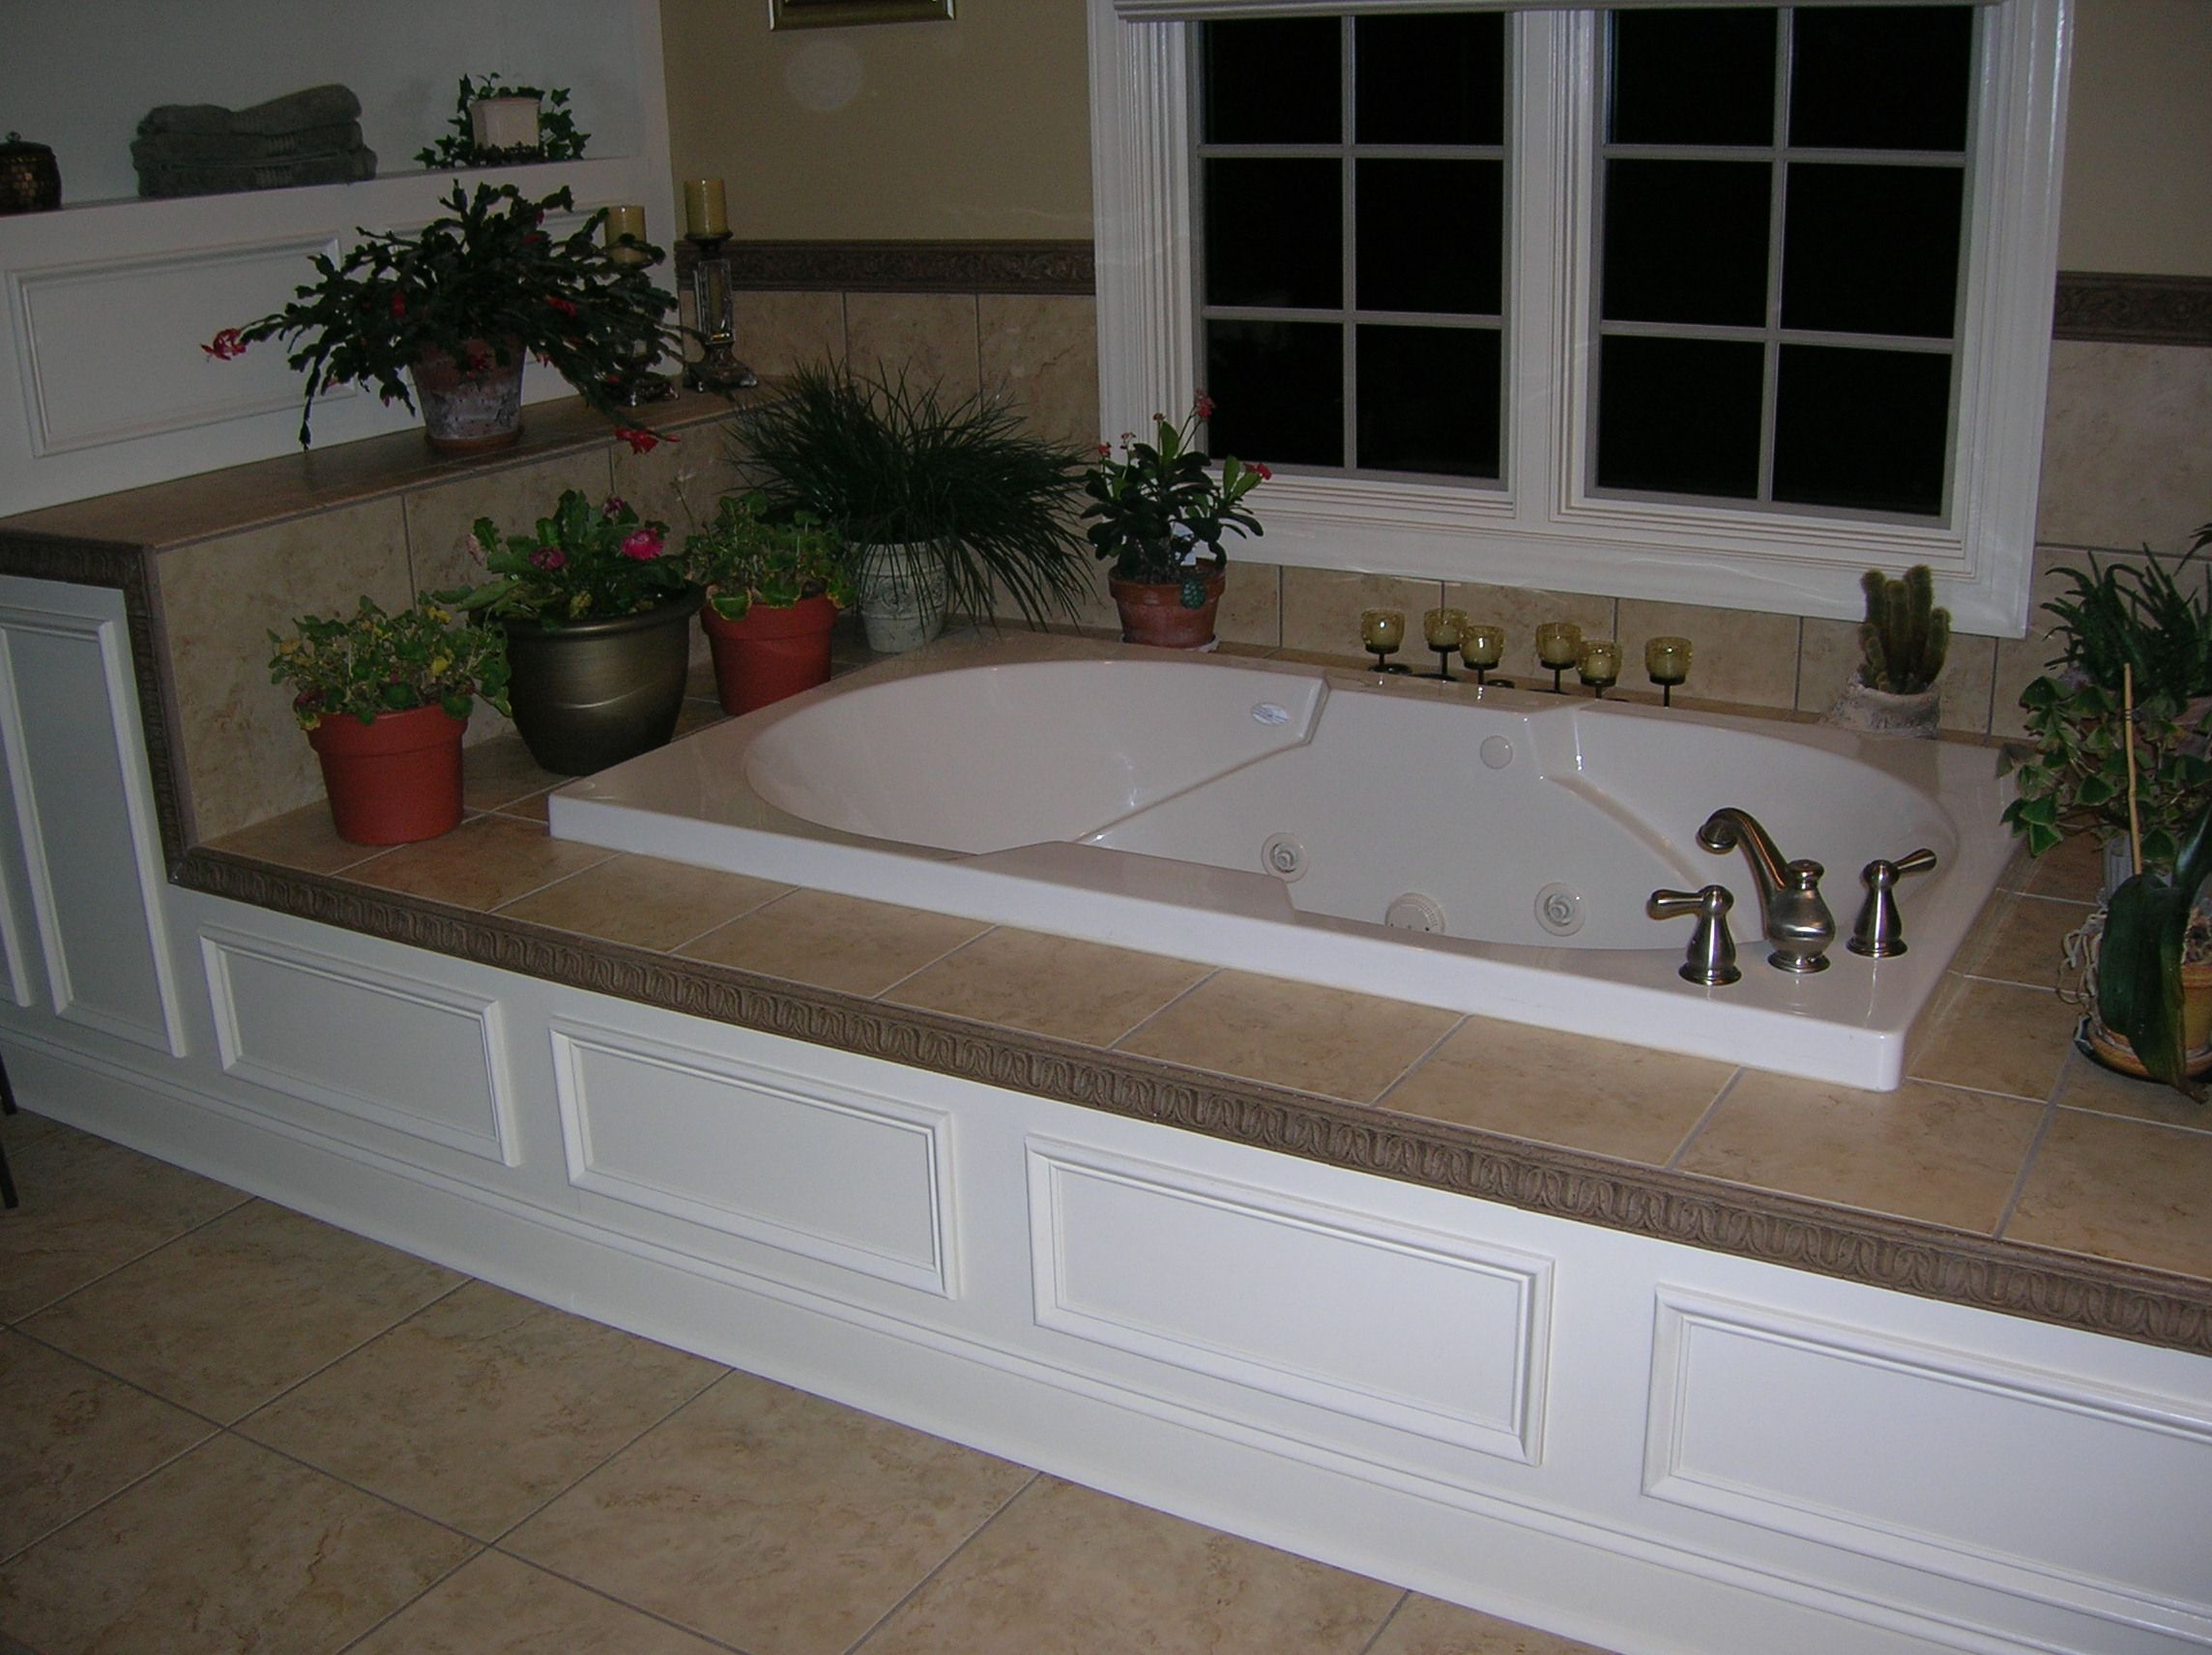 Bathtub tile tub surround tile bathtub shower bathroom - Bathroom tub surround tile ideas ...